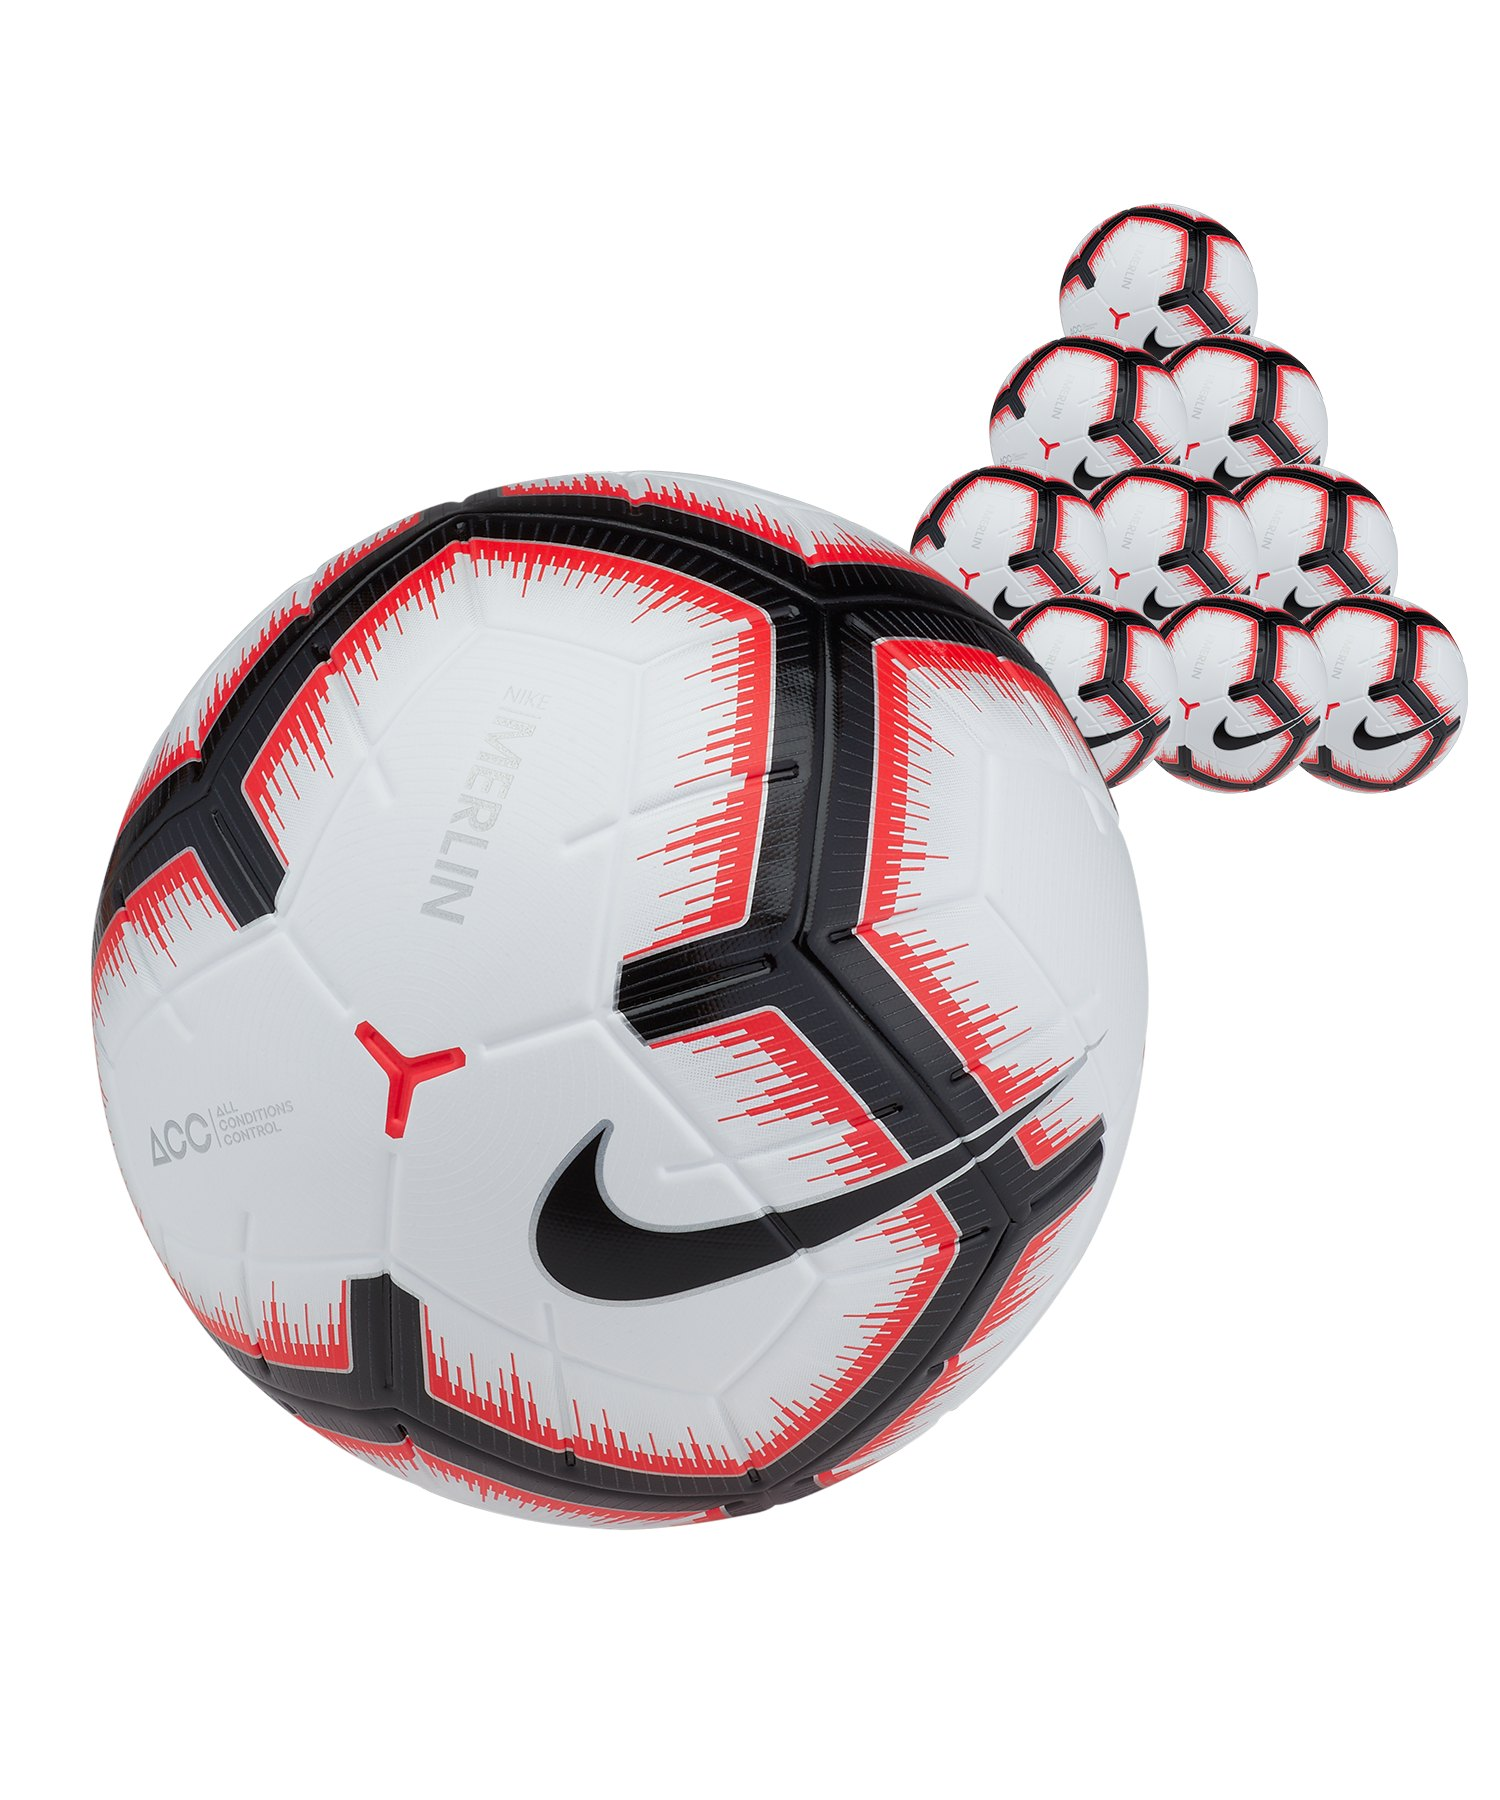 Nike Merlin 10x Spielball Weiss F100 - weiss